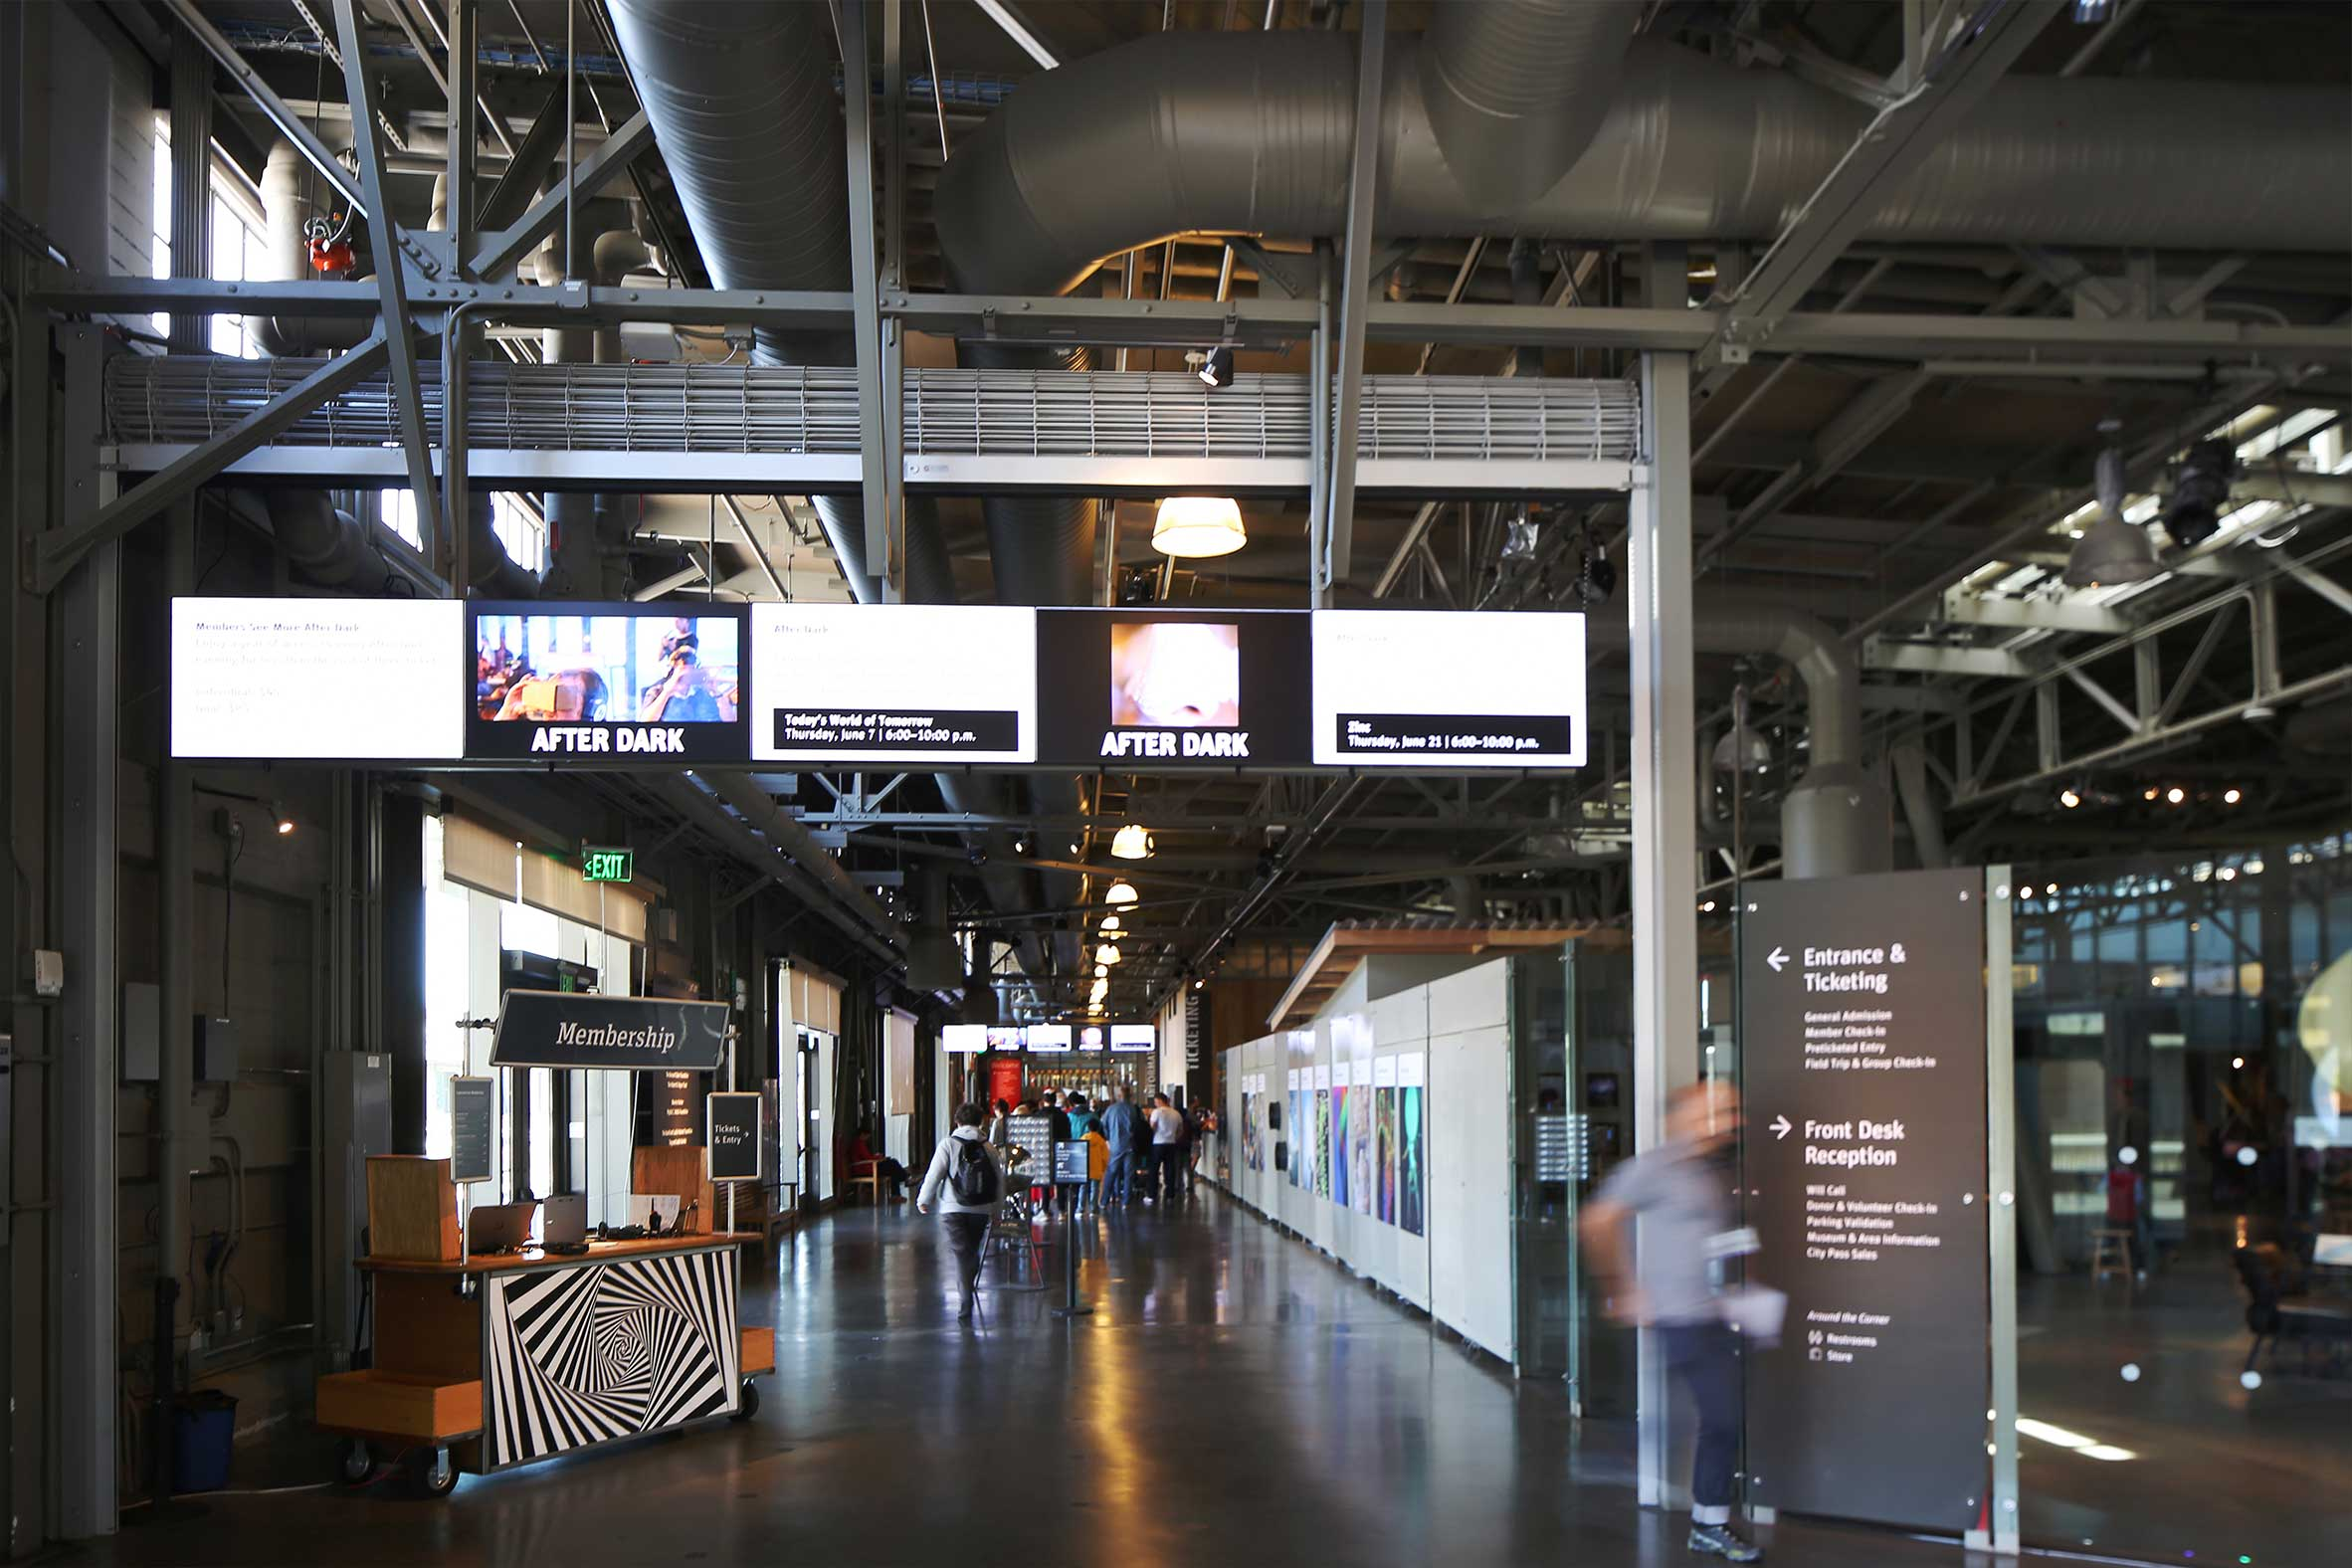 Exploratorium Entrance at San Francisco Embarcadero with Visitors